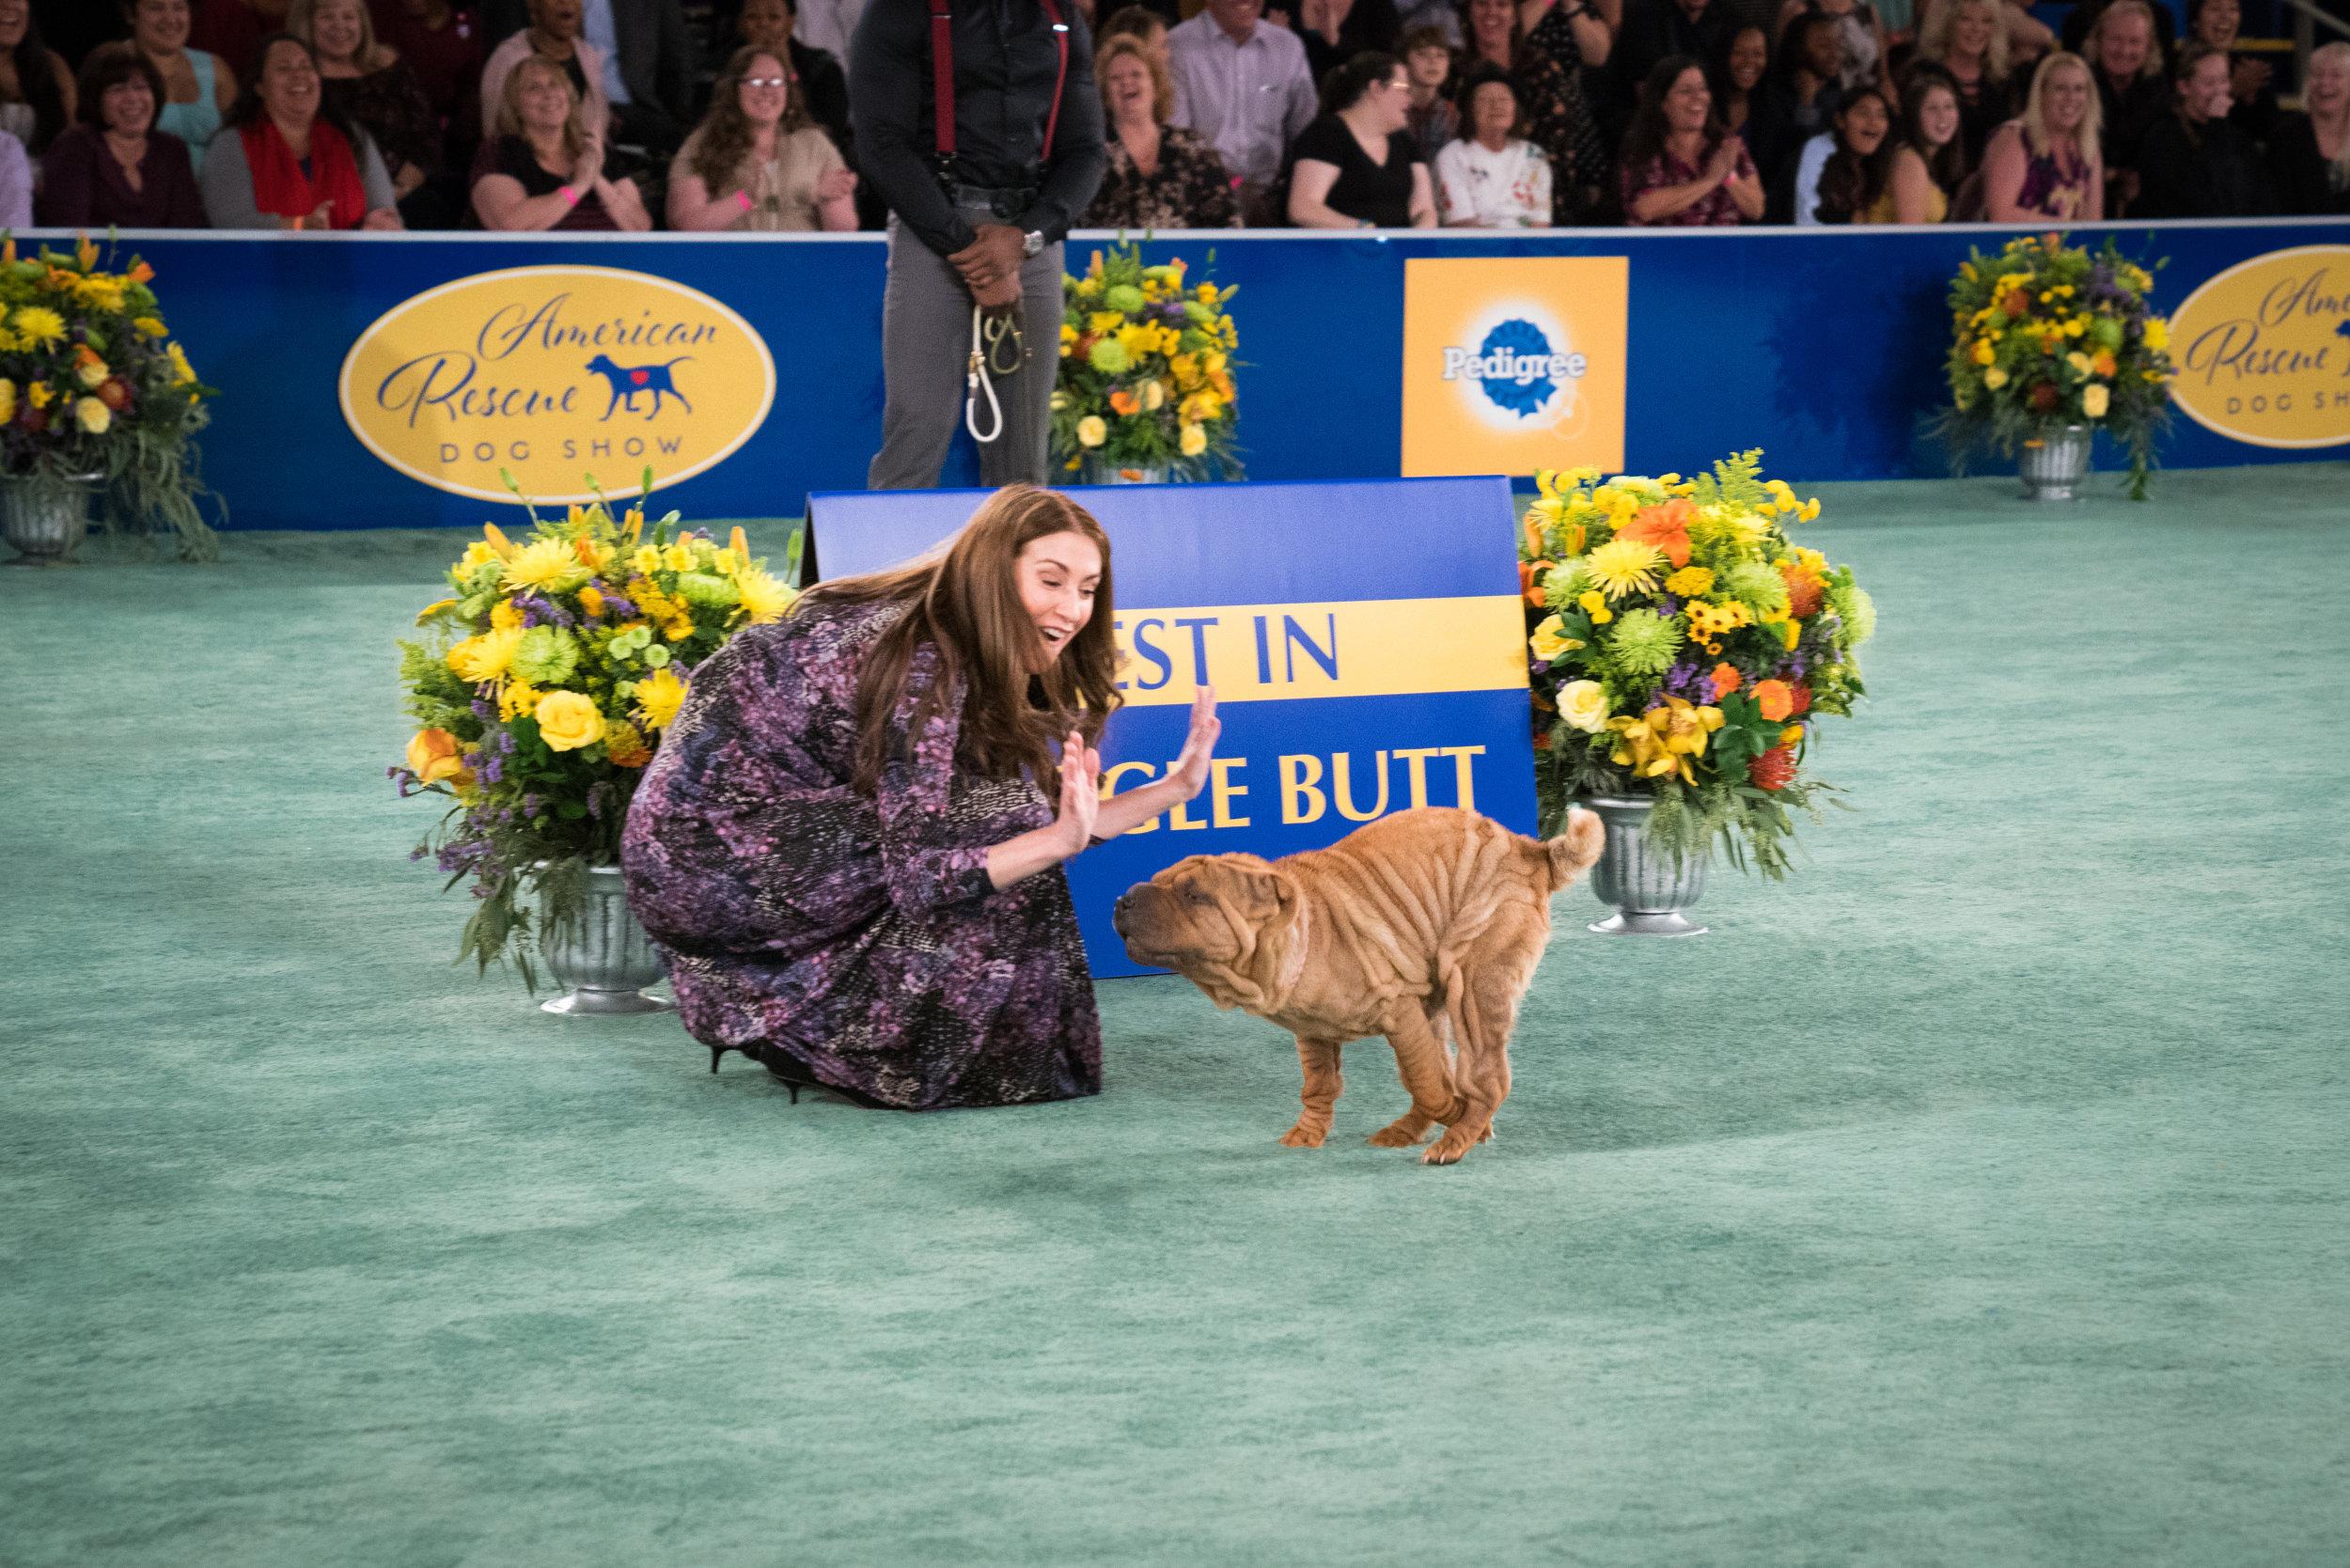 American Rescue Dog Show - The Winners | Hallmark Channel